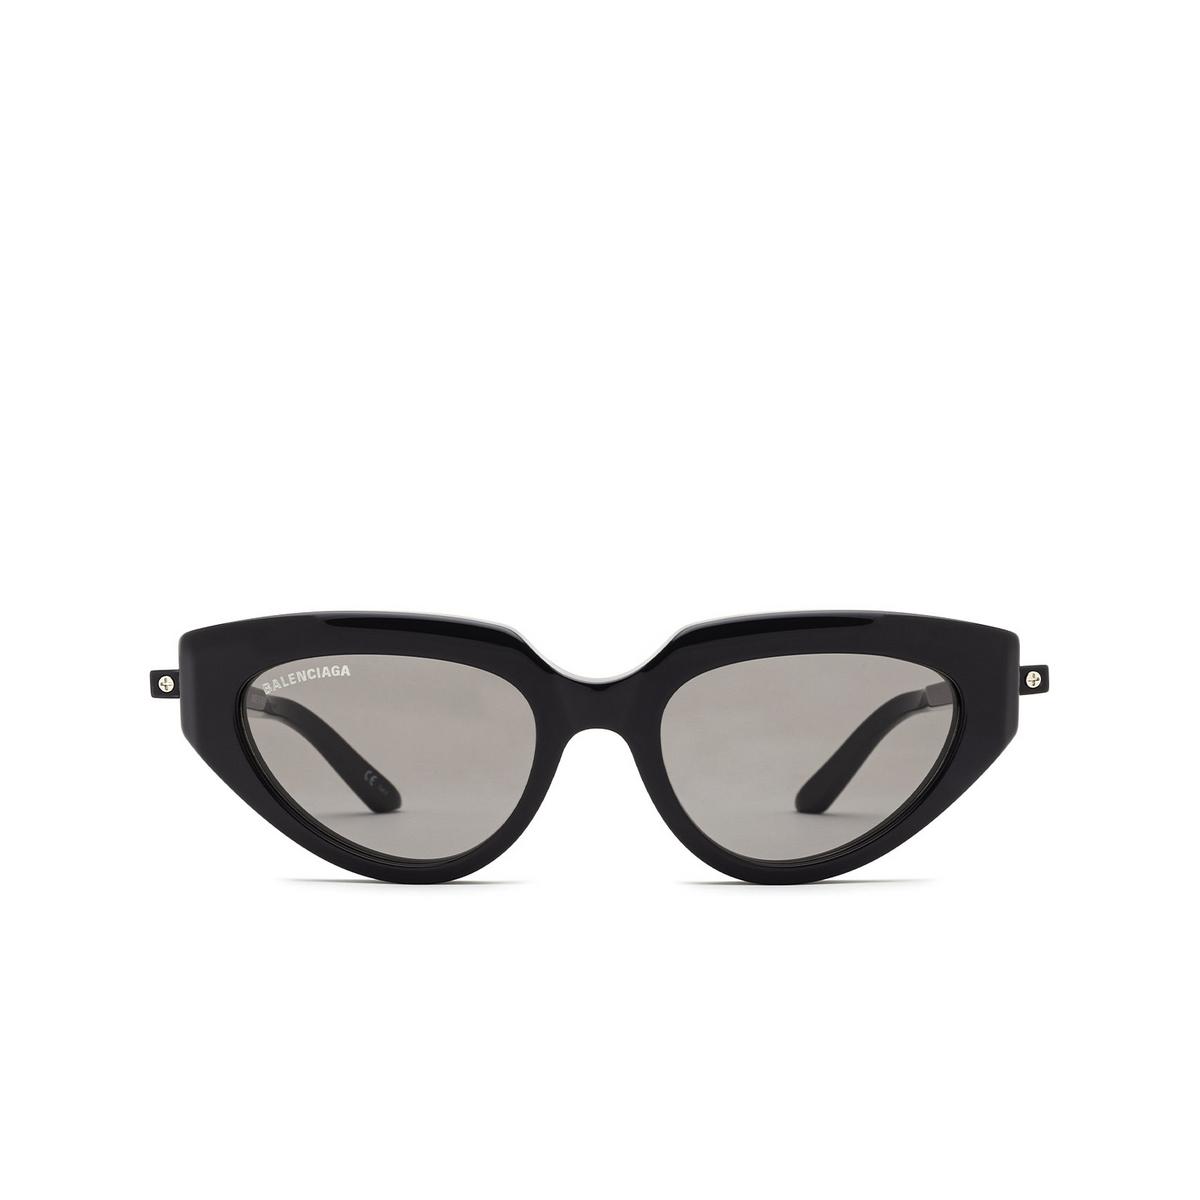 Balenciaga® Cat-eye Sunglasses: BB0159S color Grey 002 - front view.